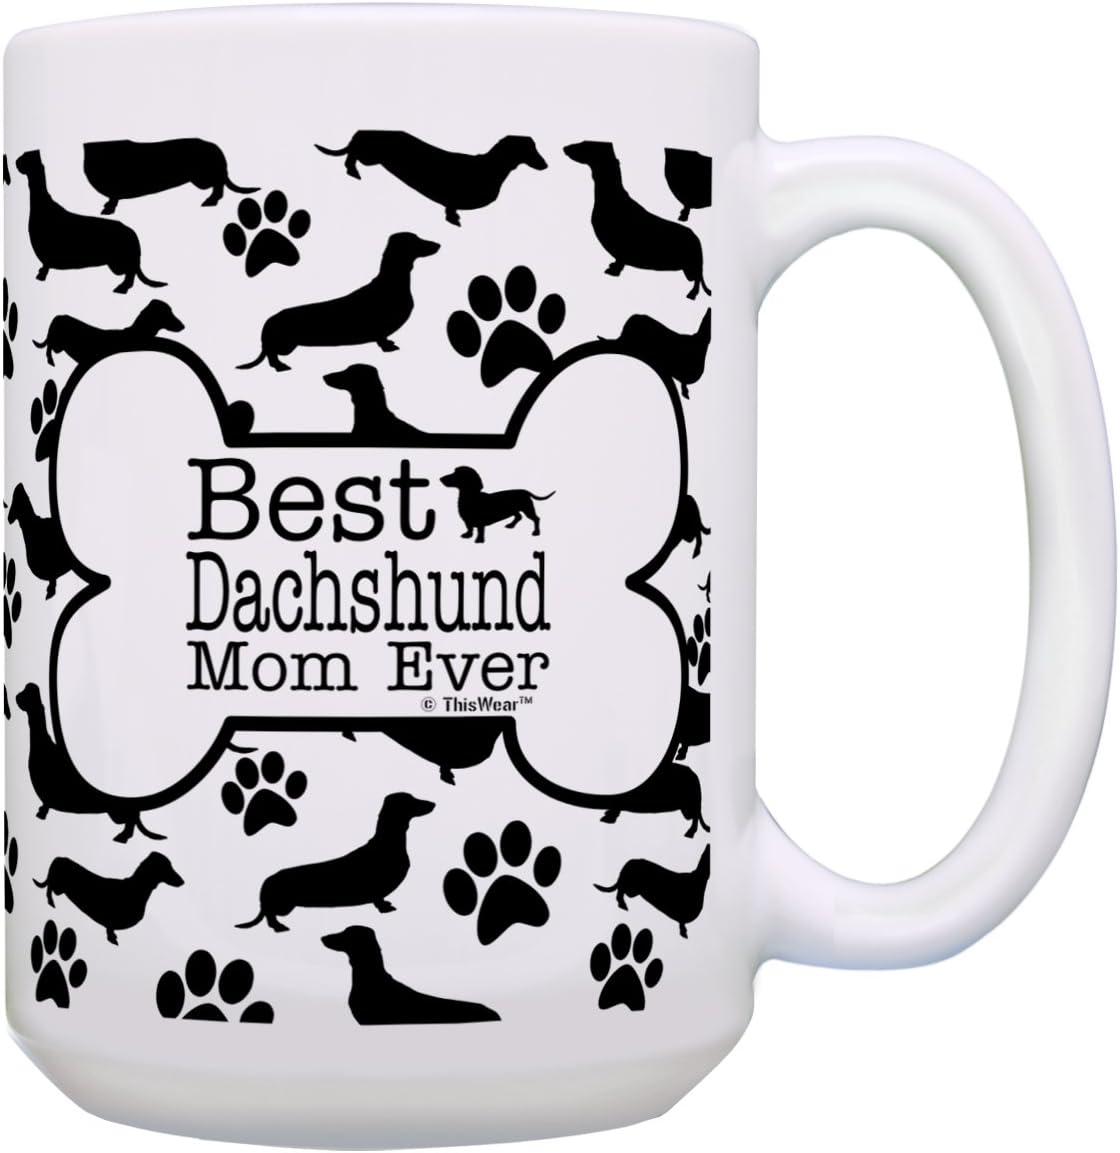 Dachshund Dog Gifts Best Ranking TOP20 Mom Dachshu Pattern Ever Bone Mesa Mall